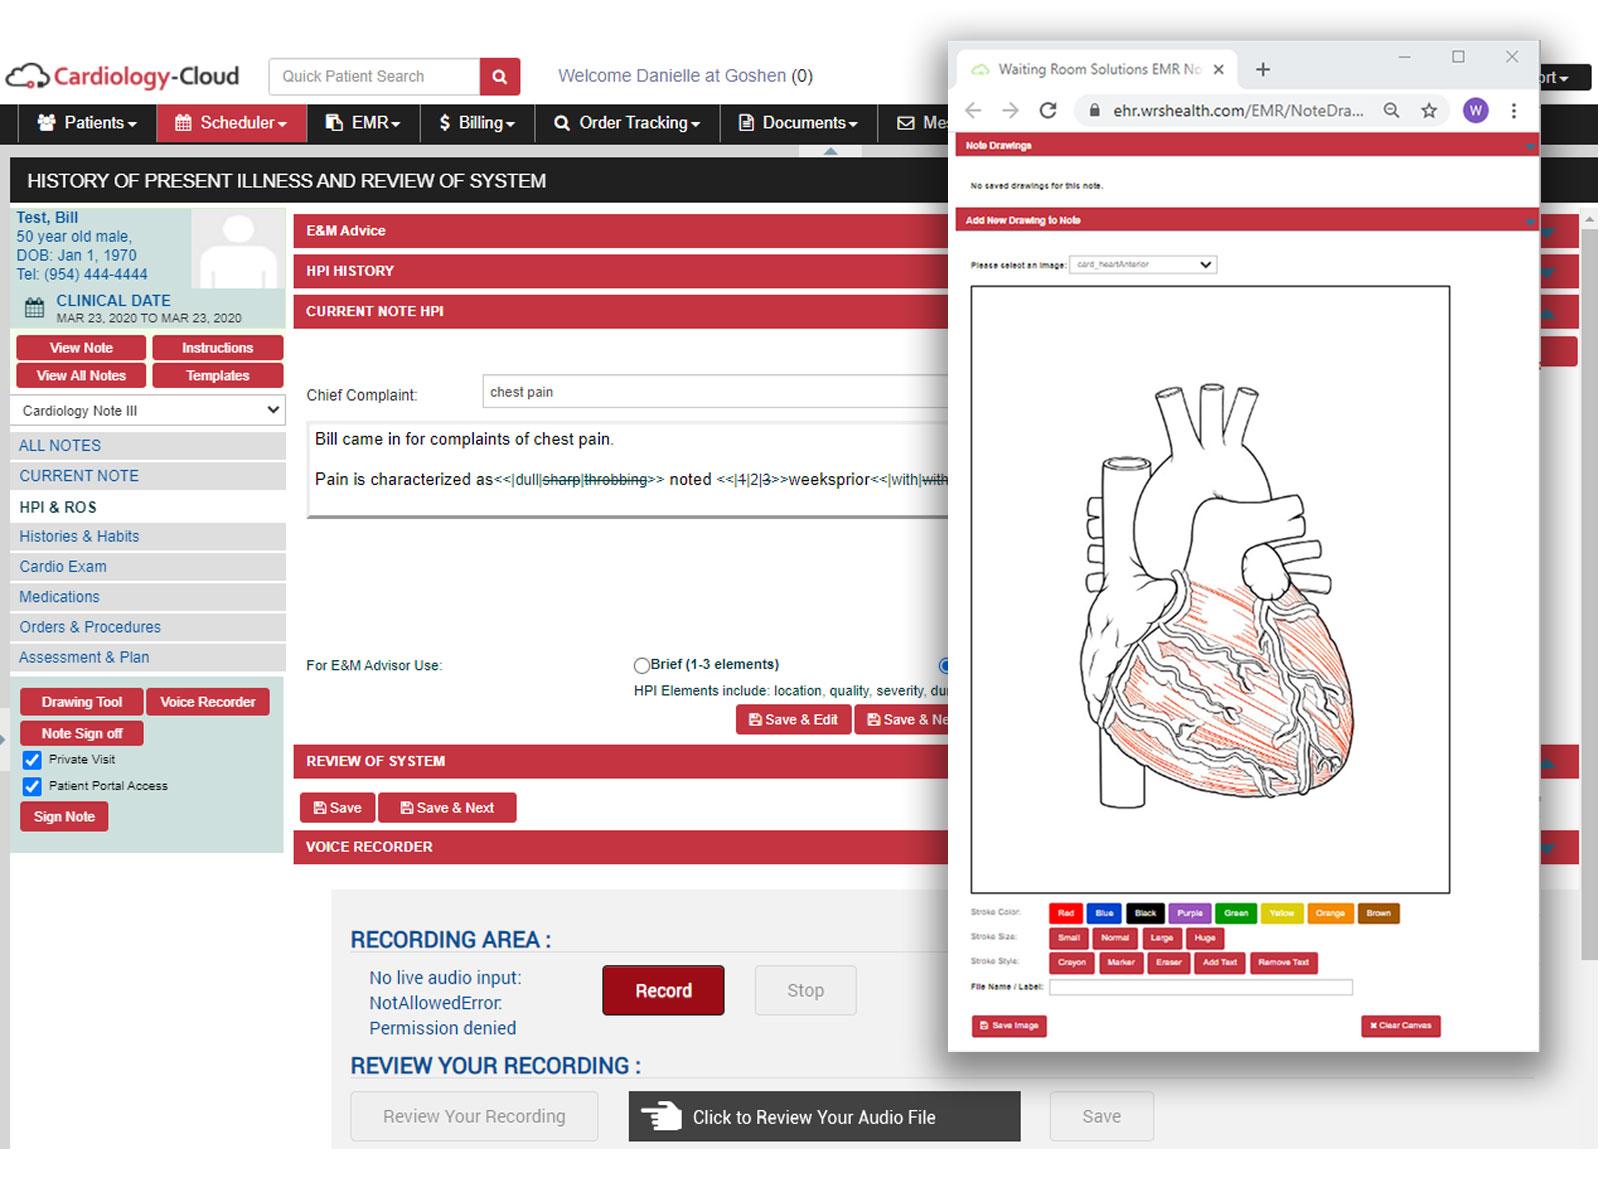 Cardiology-Cloud HPI Drawing Tool